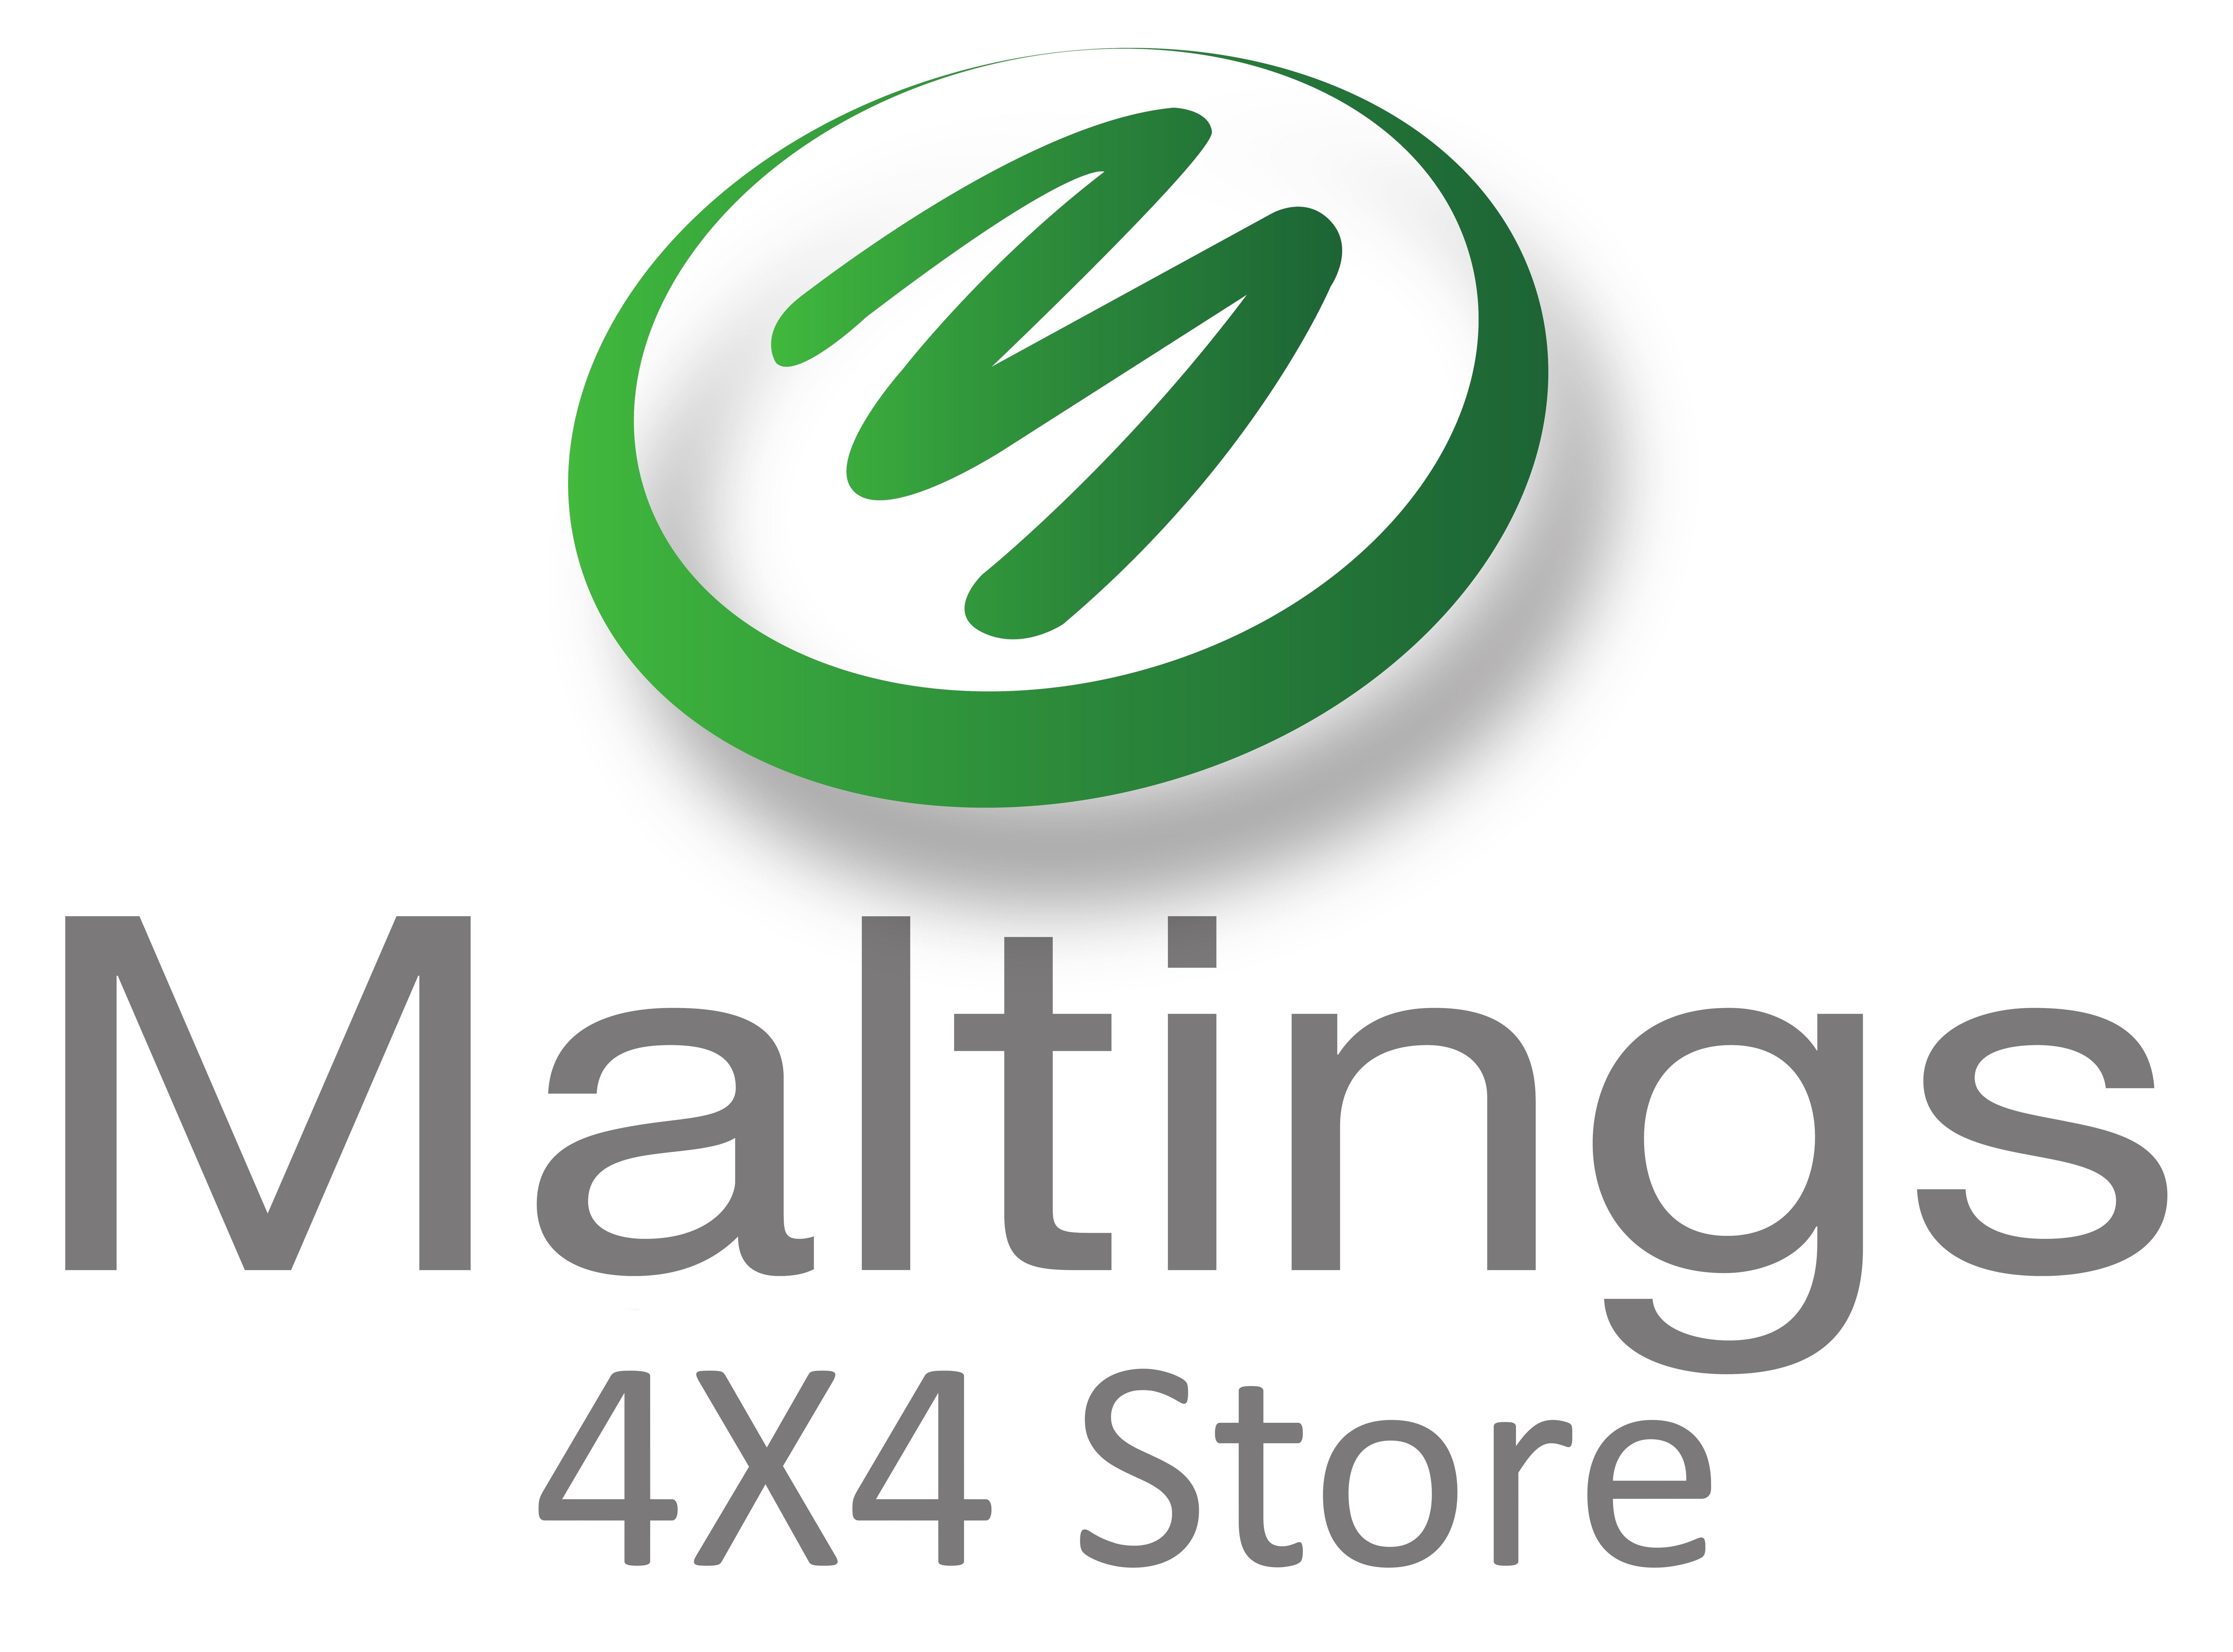 Maltings 4X4 Store